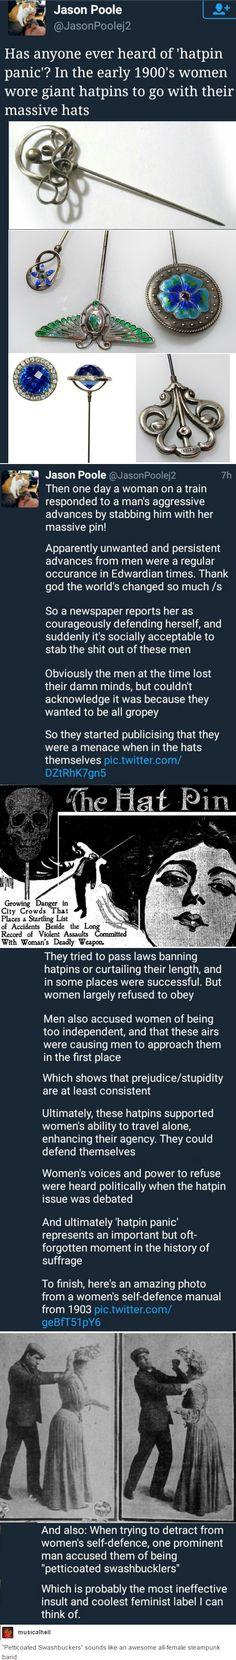 hatpin panic